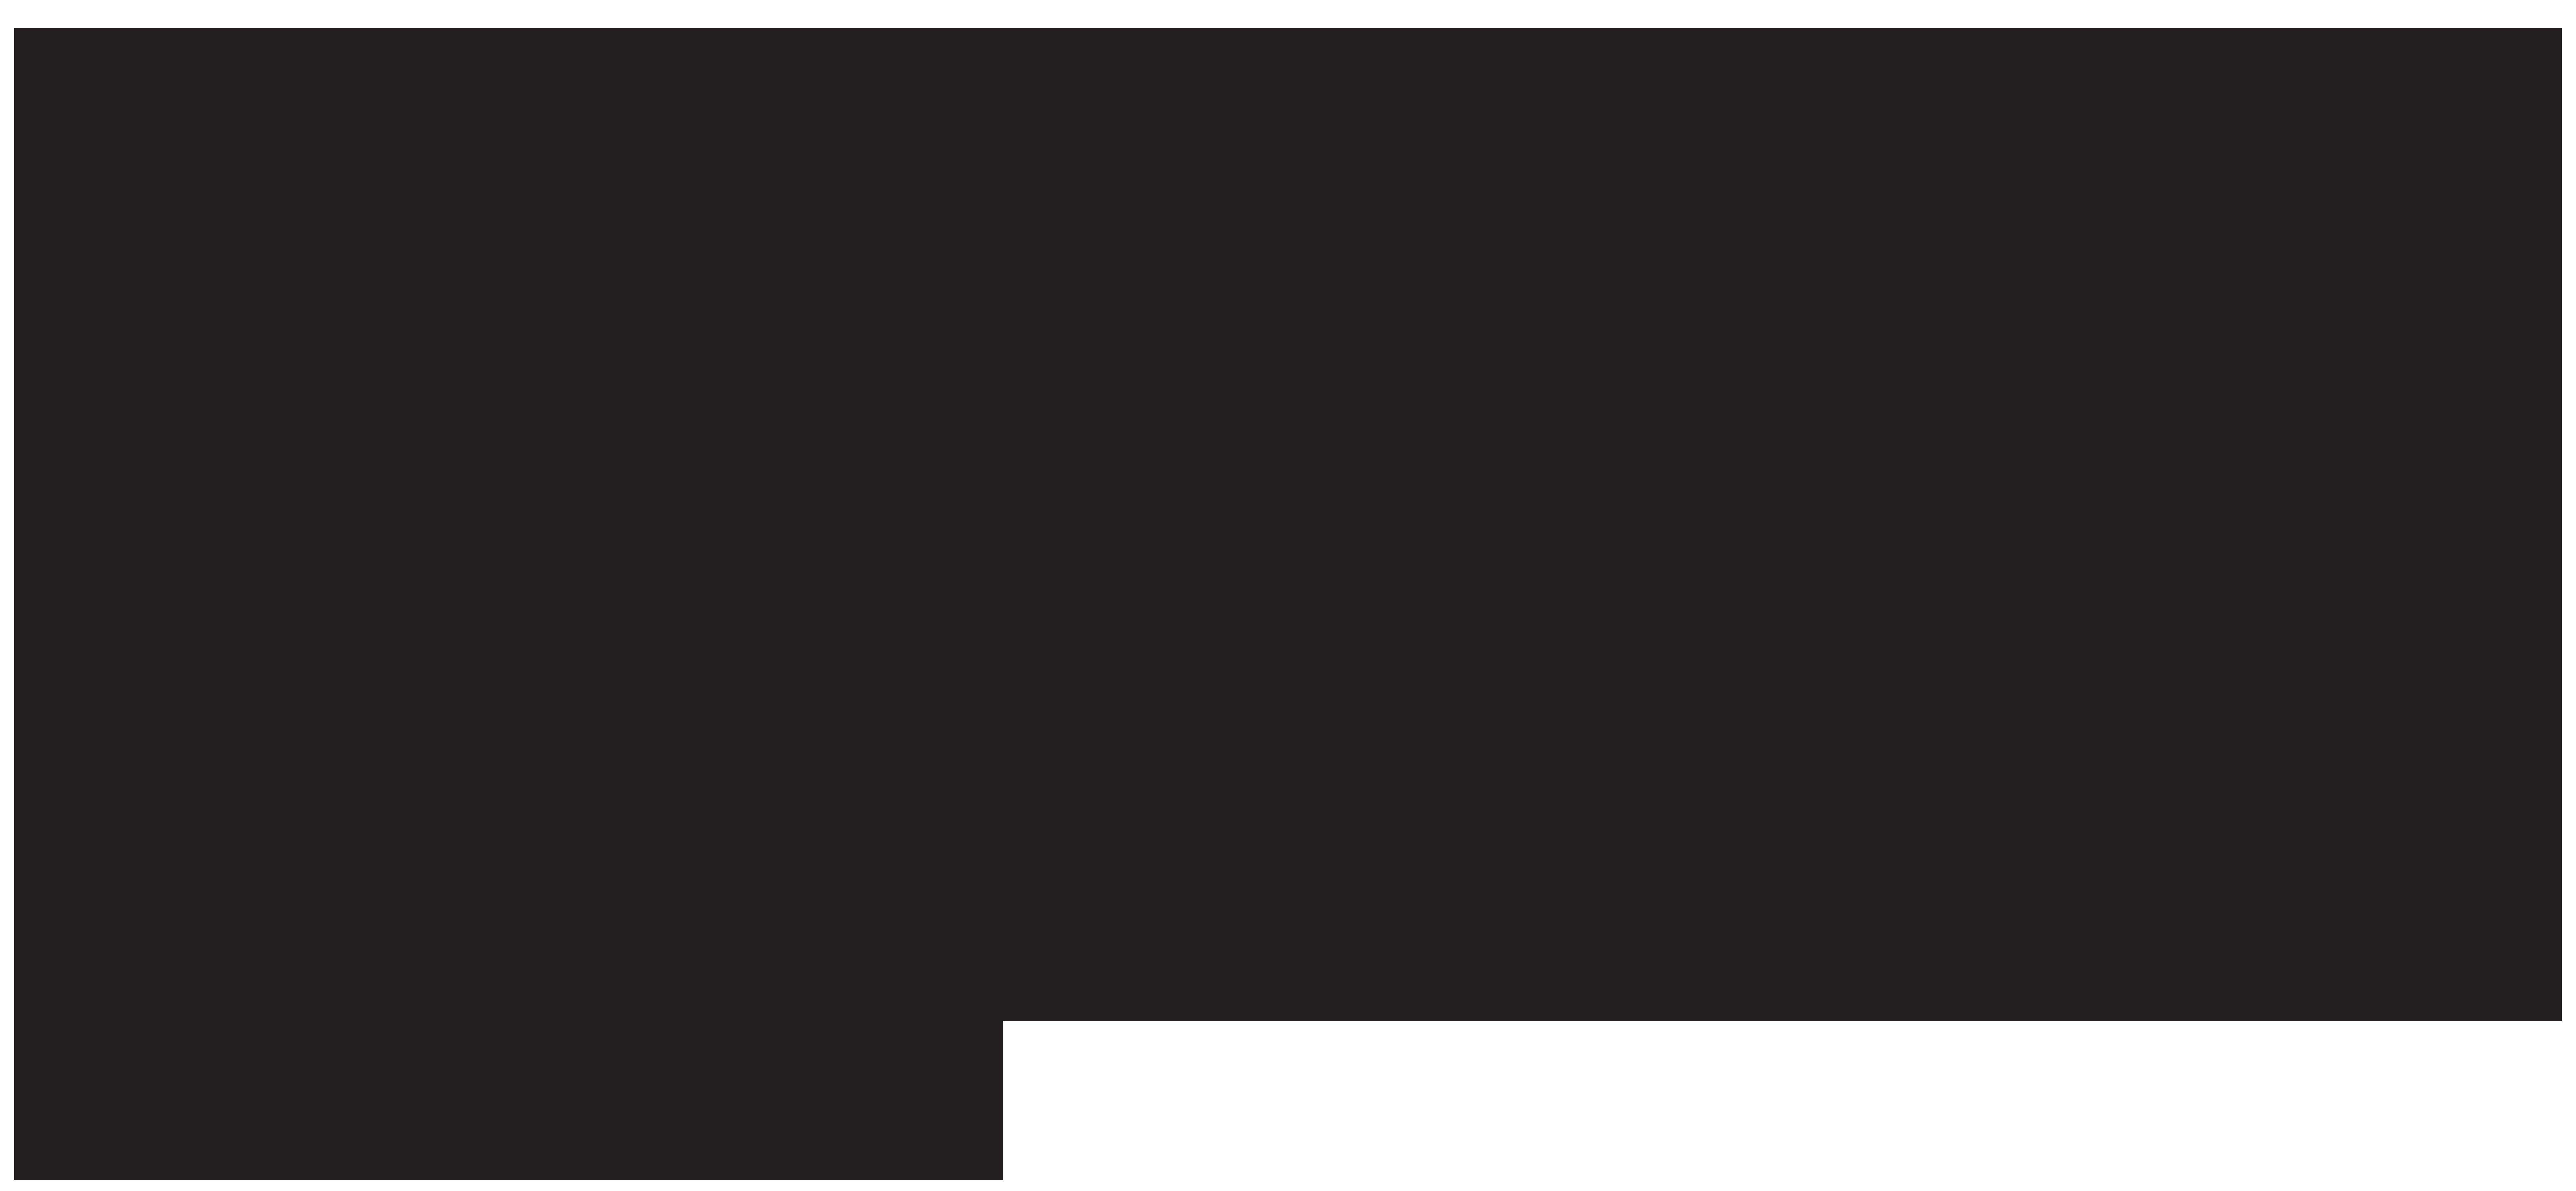 Beard Set PNG Clip Art Image.